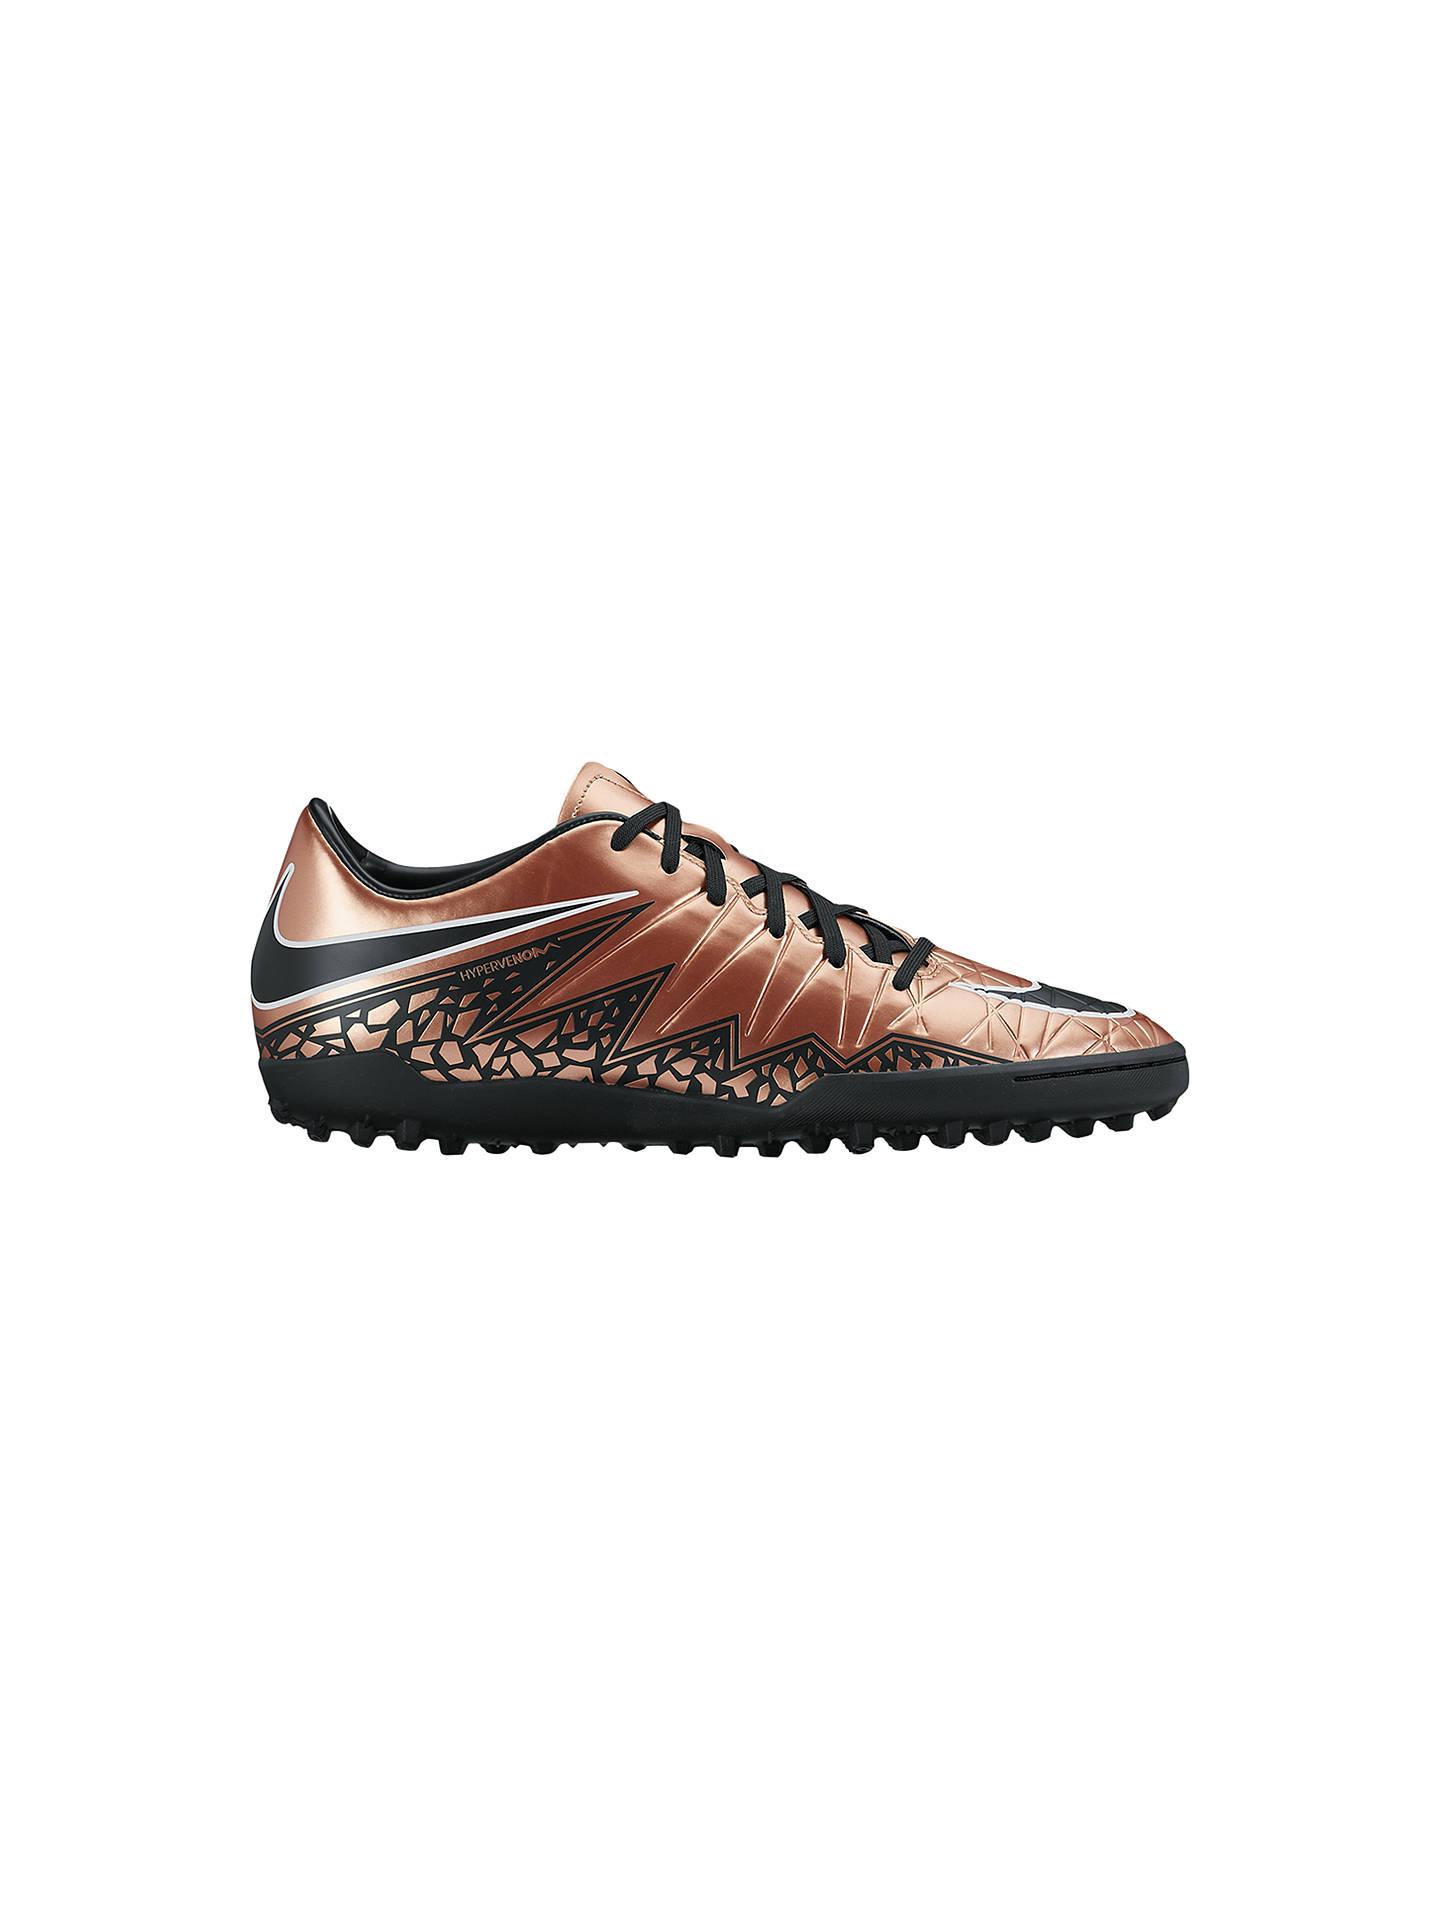 3743f3467a42 Buy Nike Hypervenom Phinish II Firm Ground Football Boots